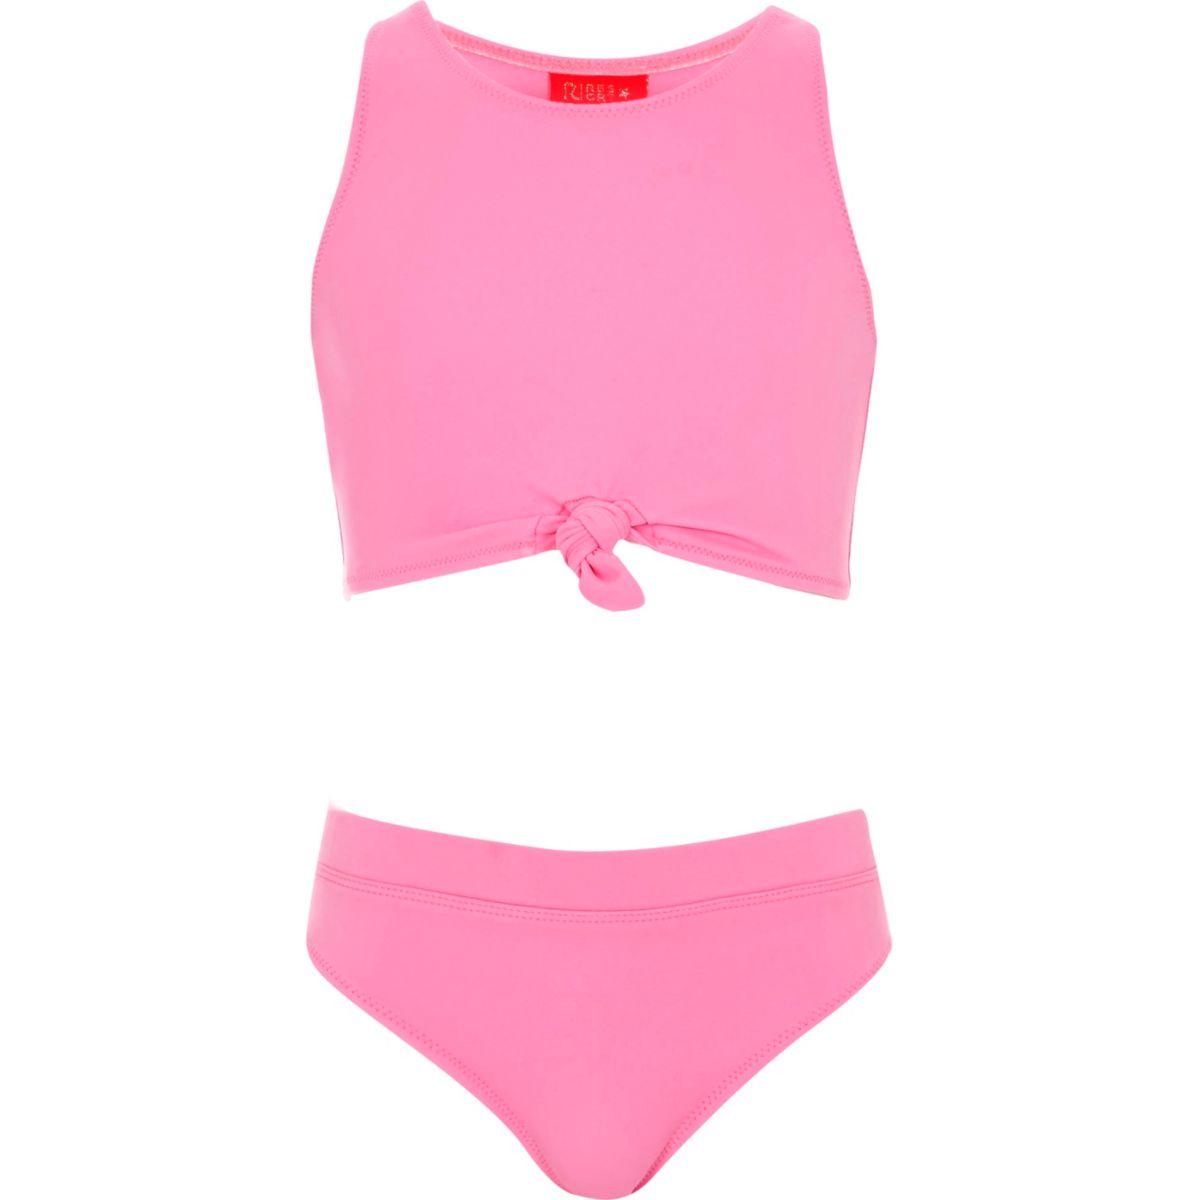 Ensemble de bikini crop top noué rose pour fille